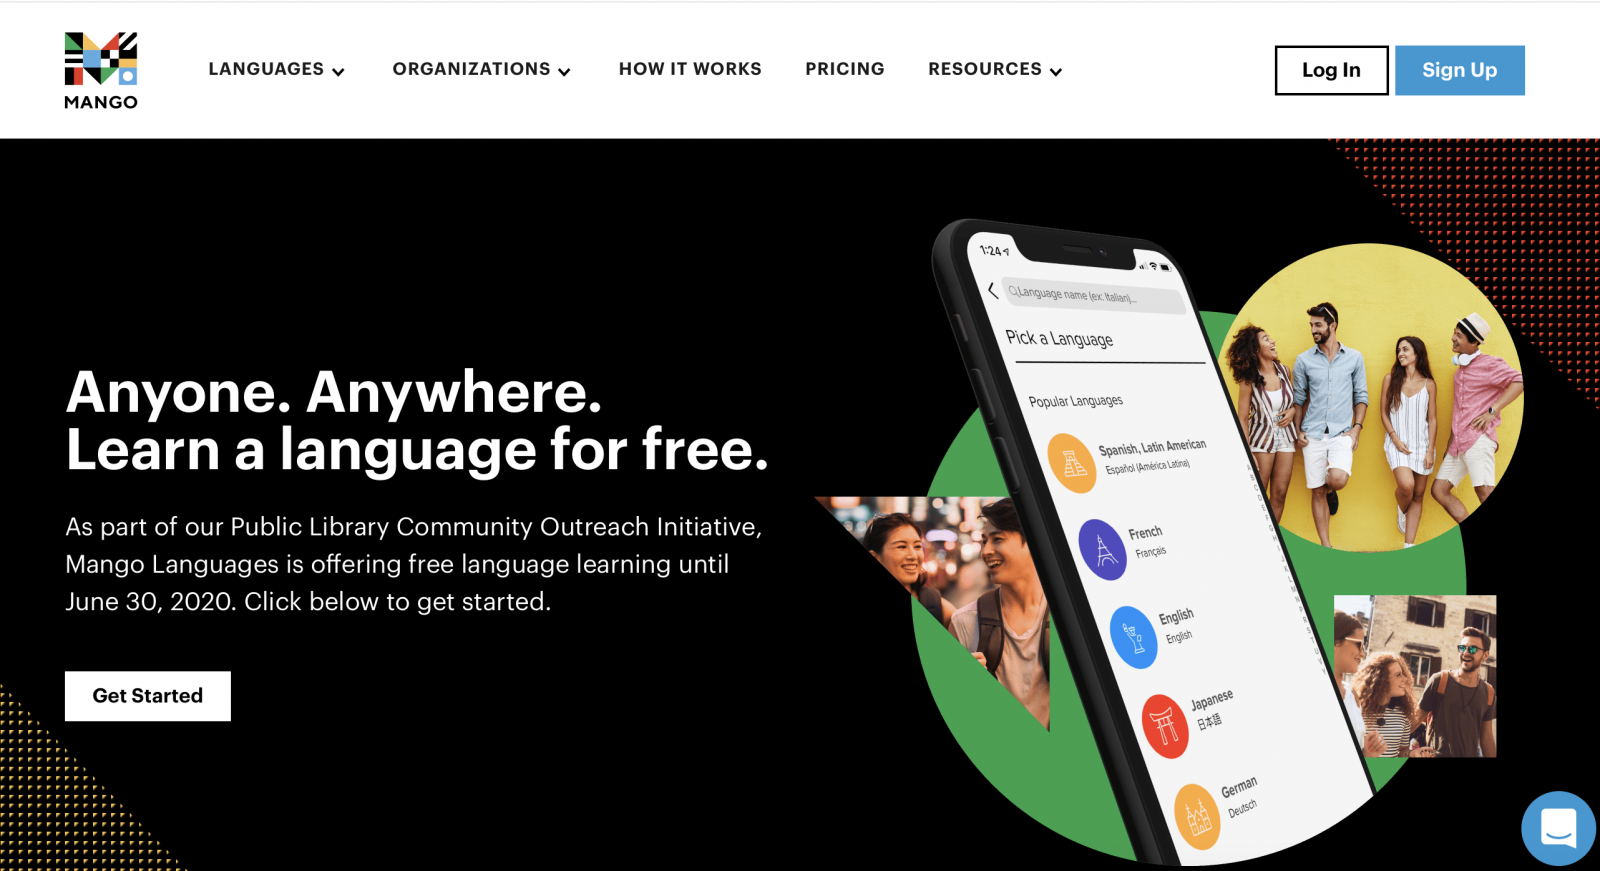 The Mango website.